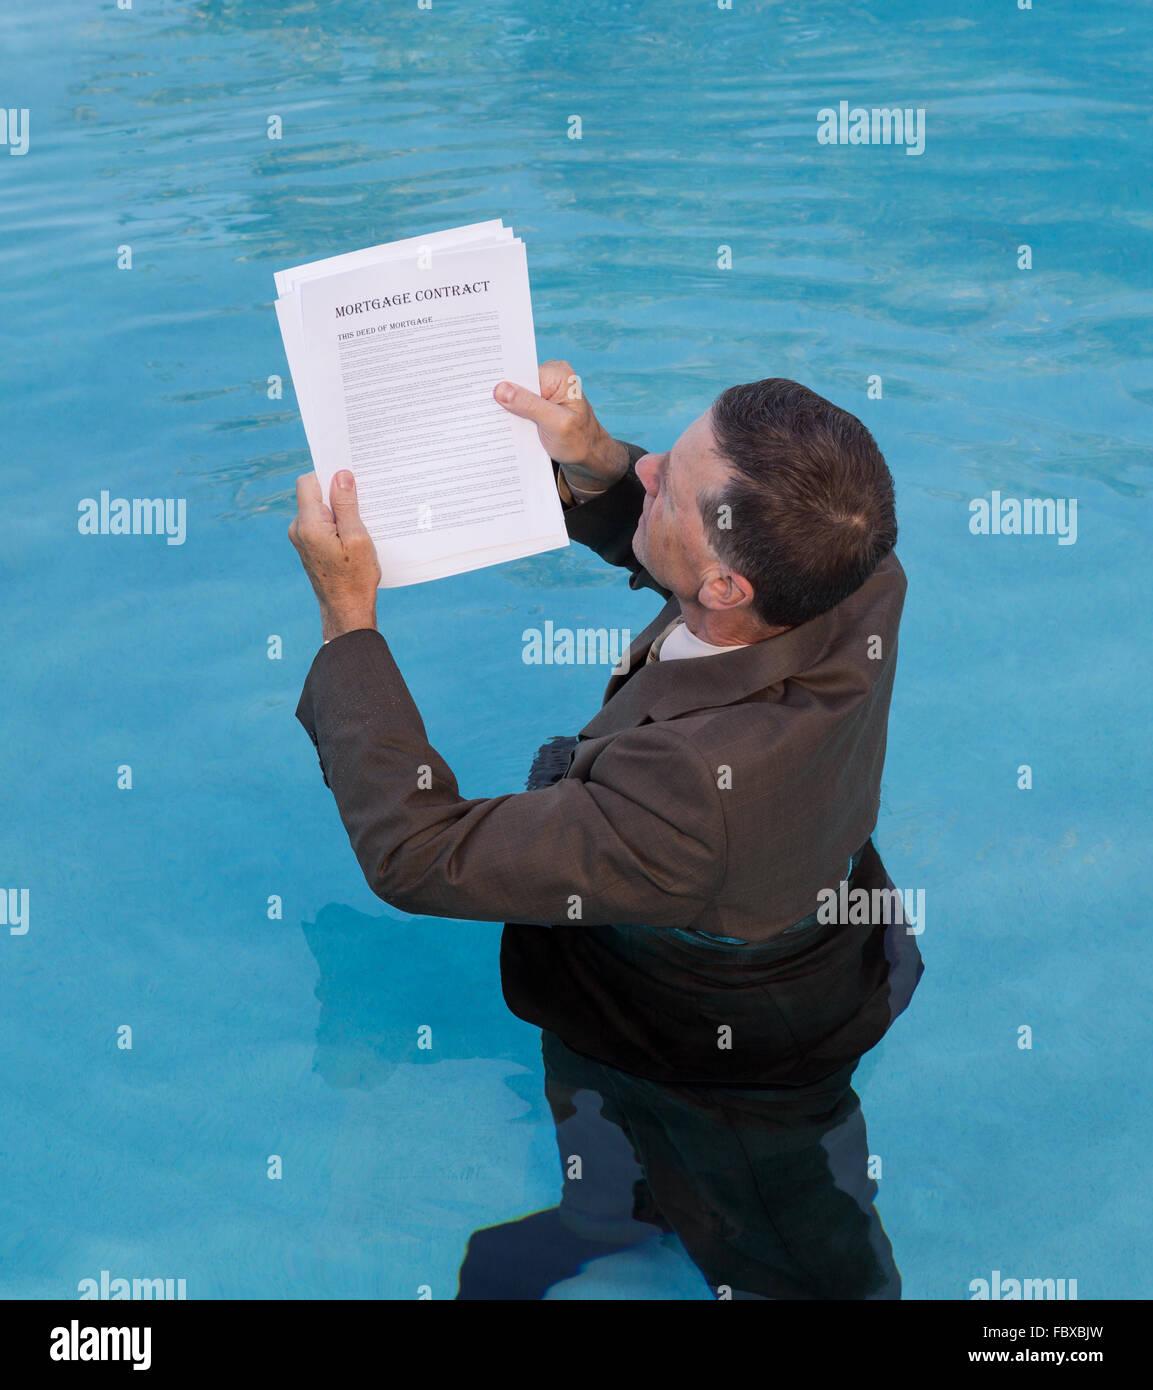 Drowning Paperwork Stockfotos & Drowning Paperwork Bilder - Alamy